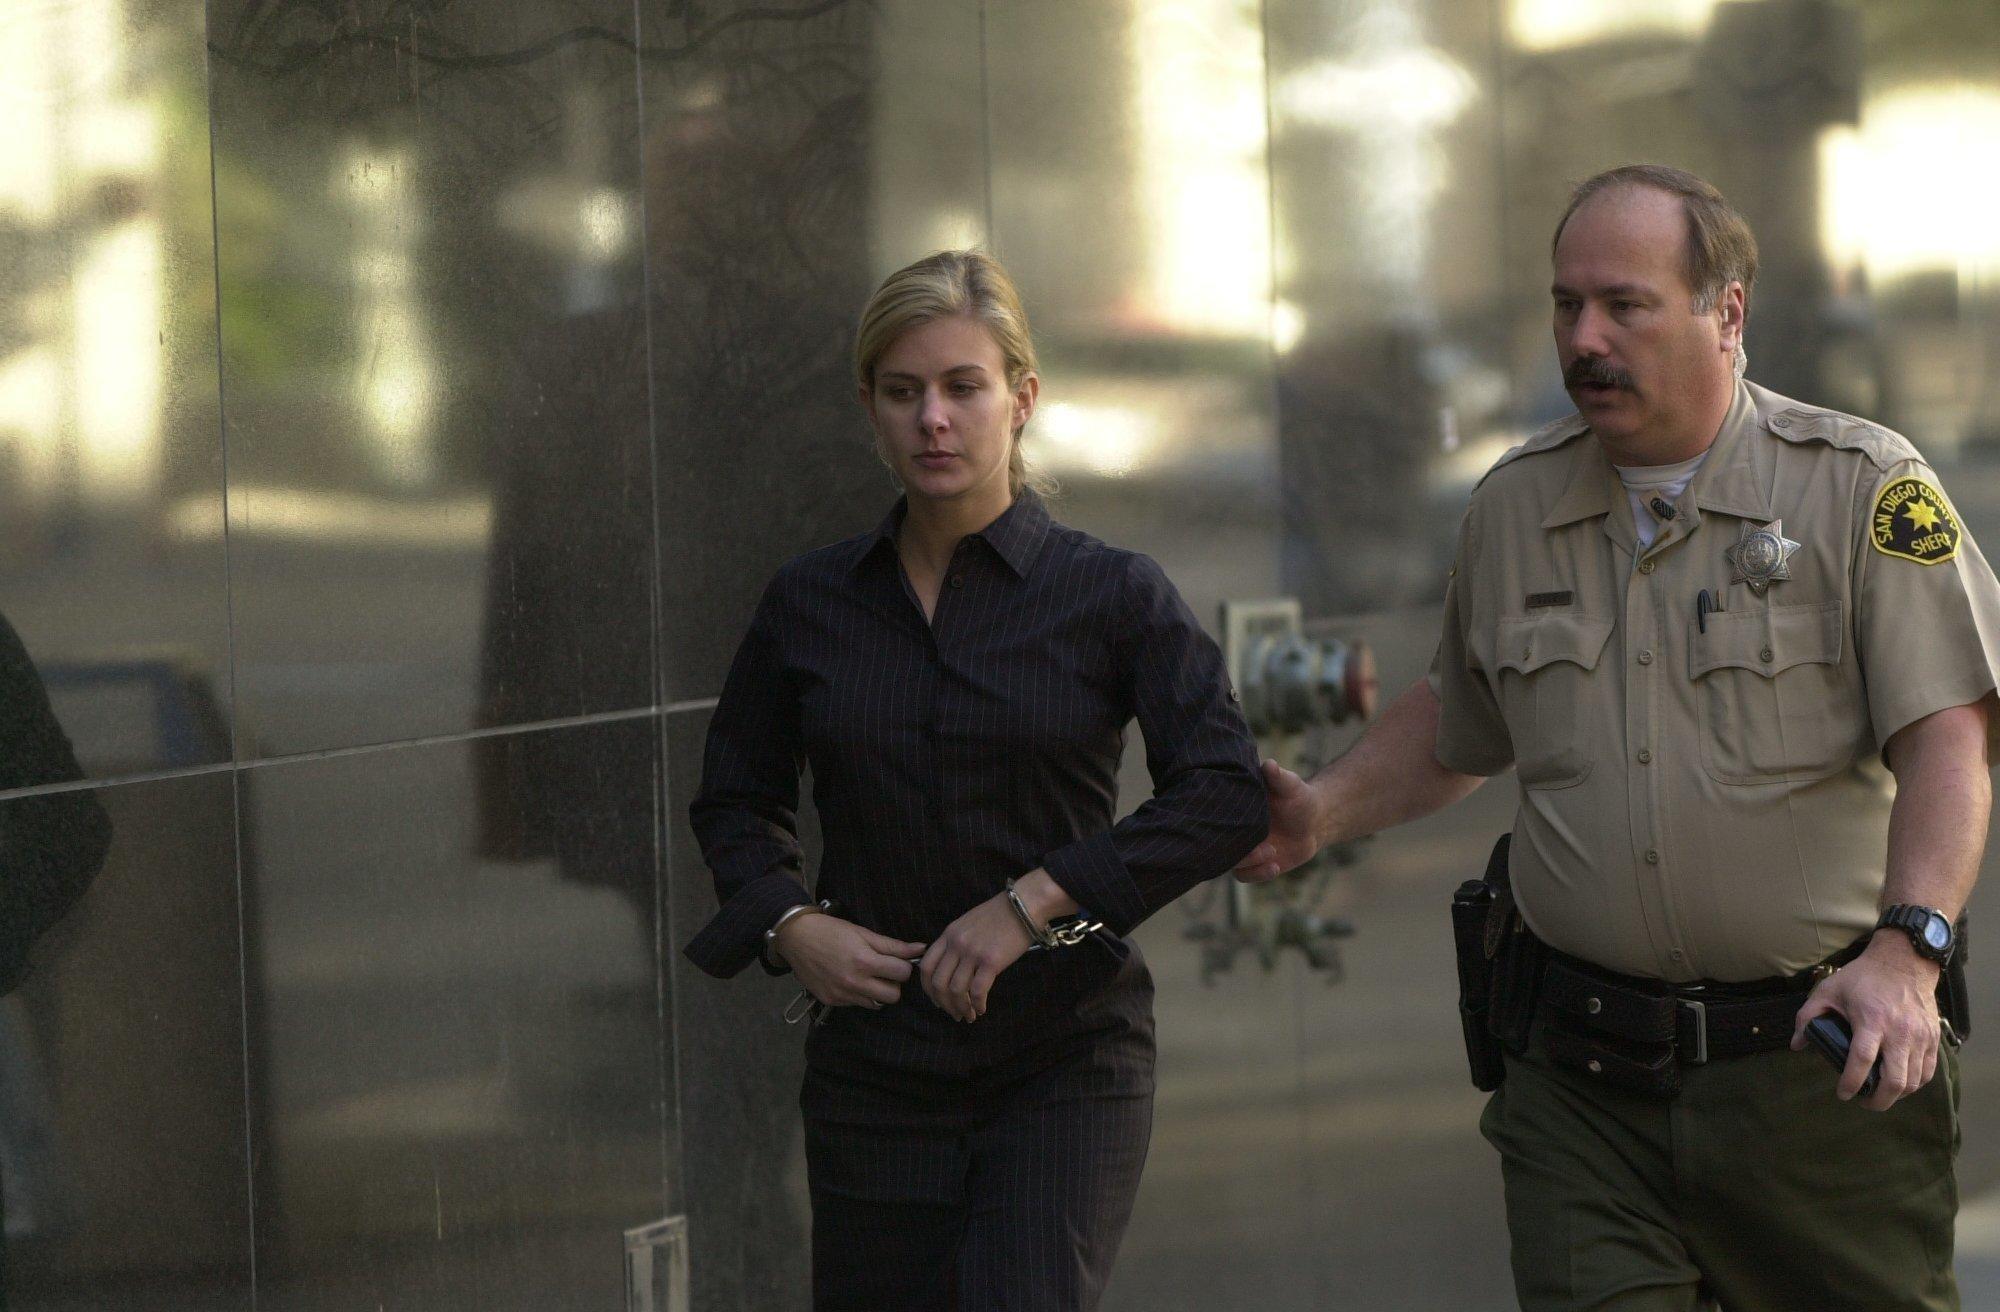 kristin rossum loses murder conviction appeal